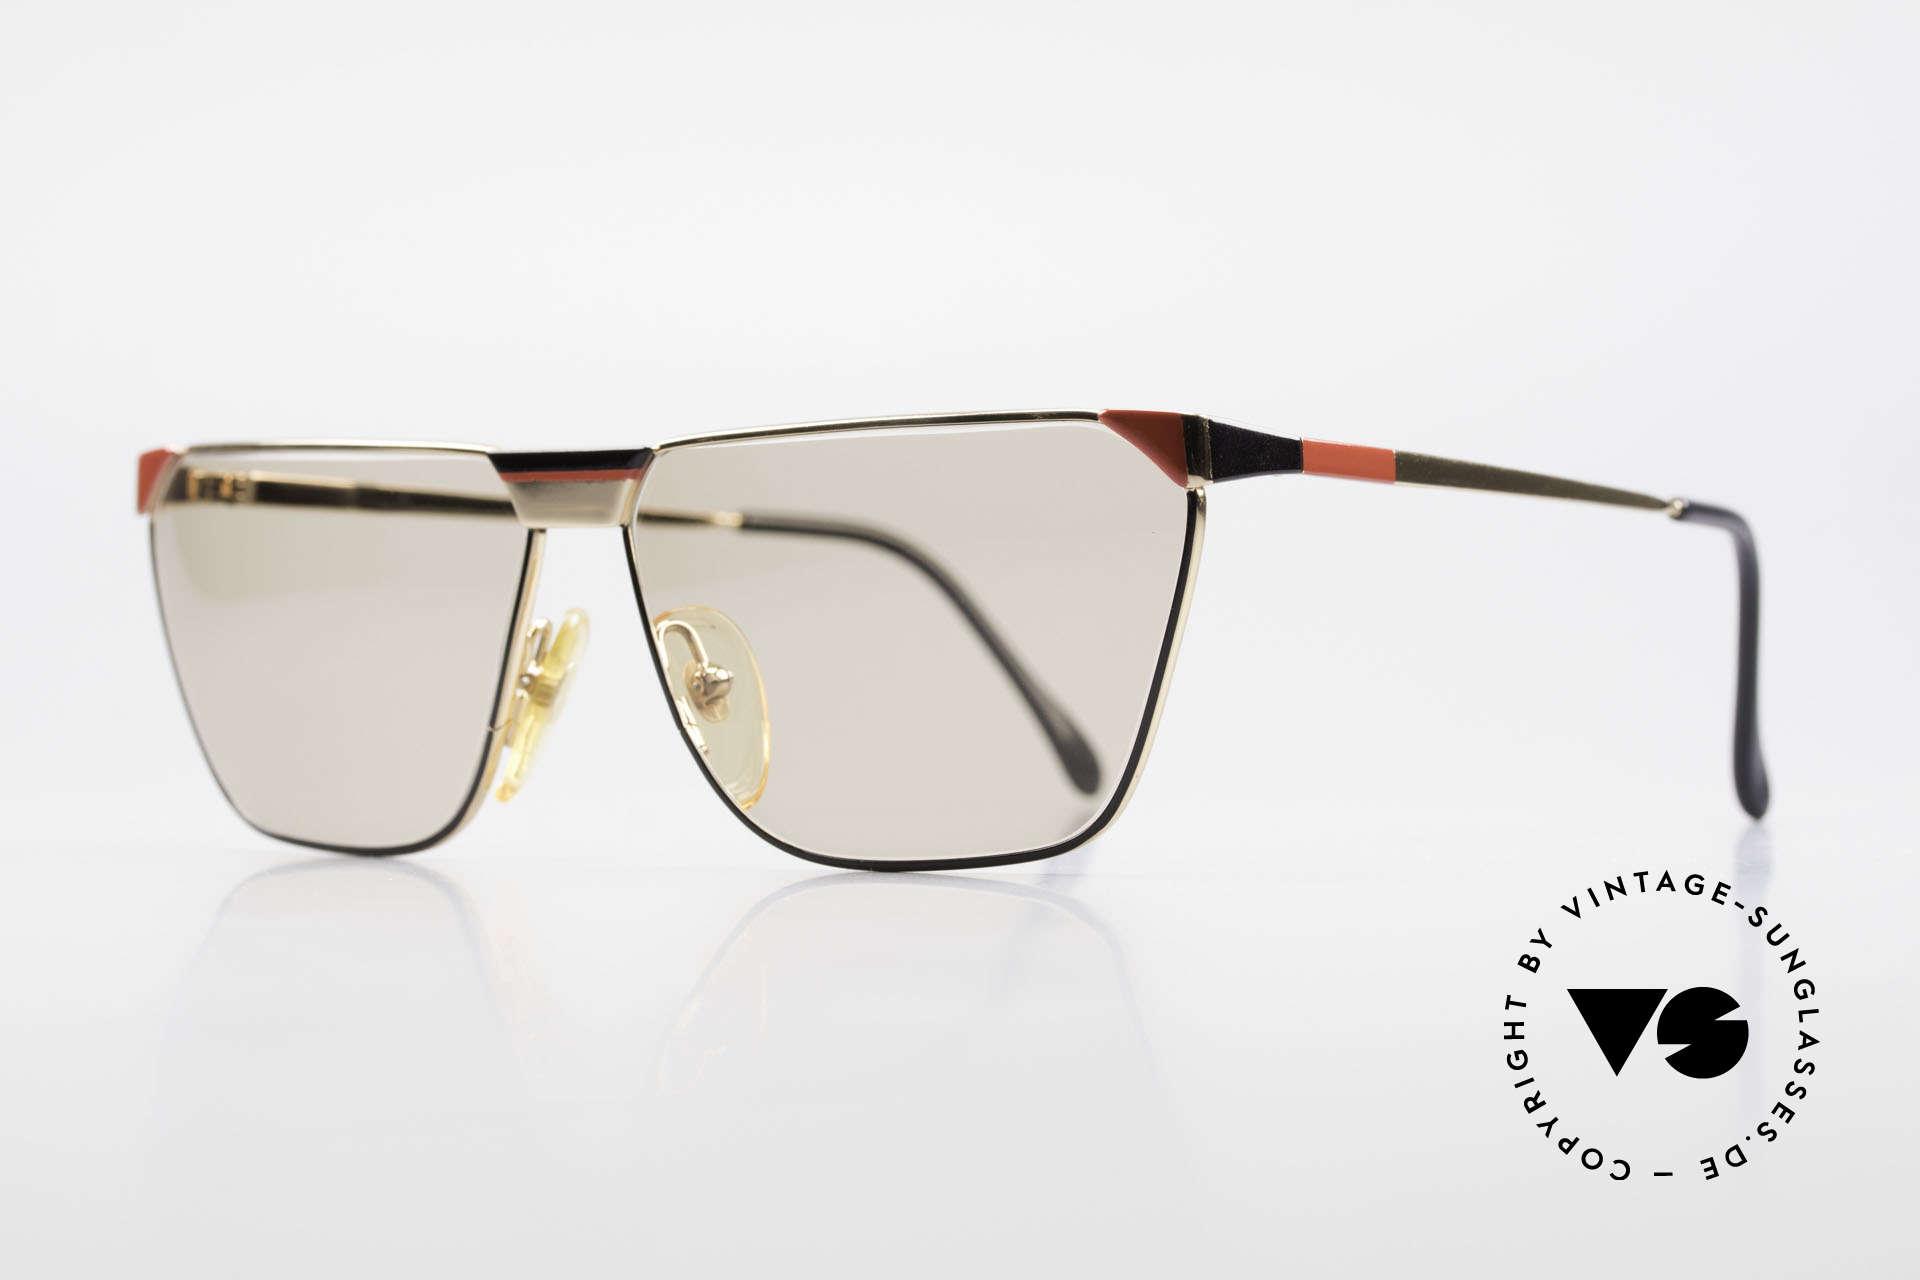 Casanova MC2 24KT Gold Plated Frame, highest quality material (24Kt gold plated frame), Made for Men